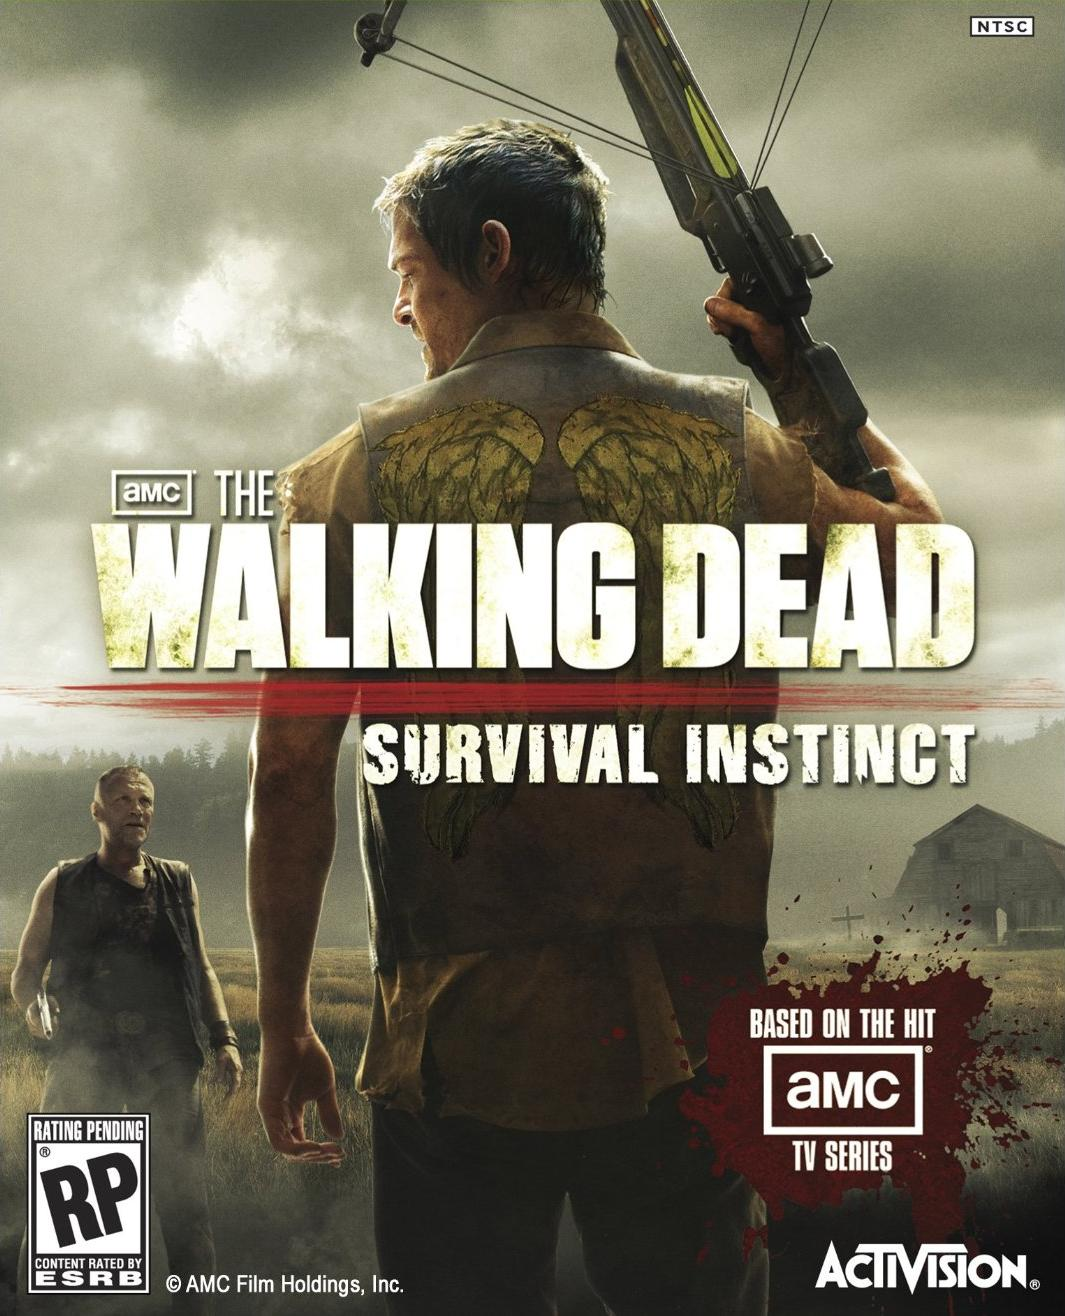 The walking dead survival instinct 2013 free download